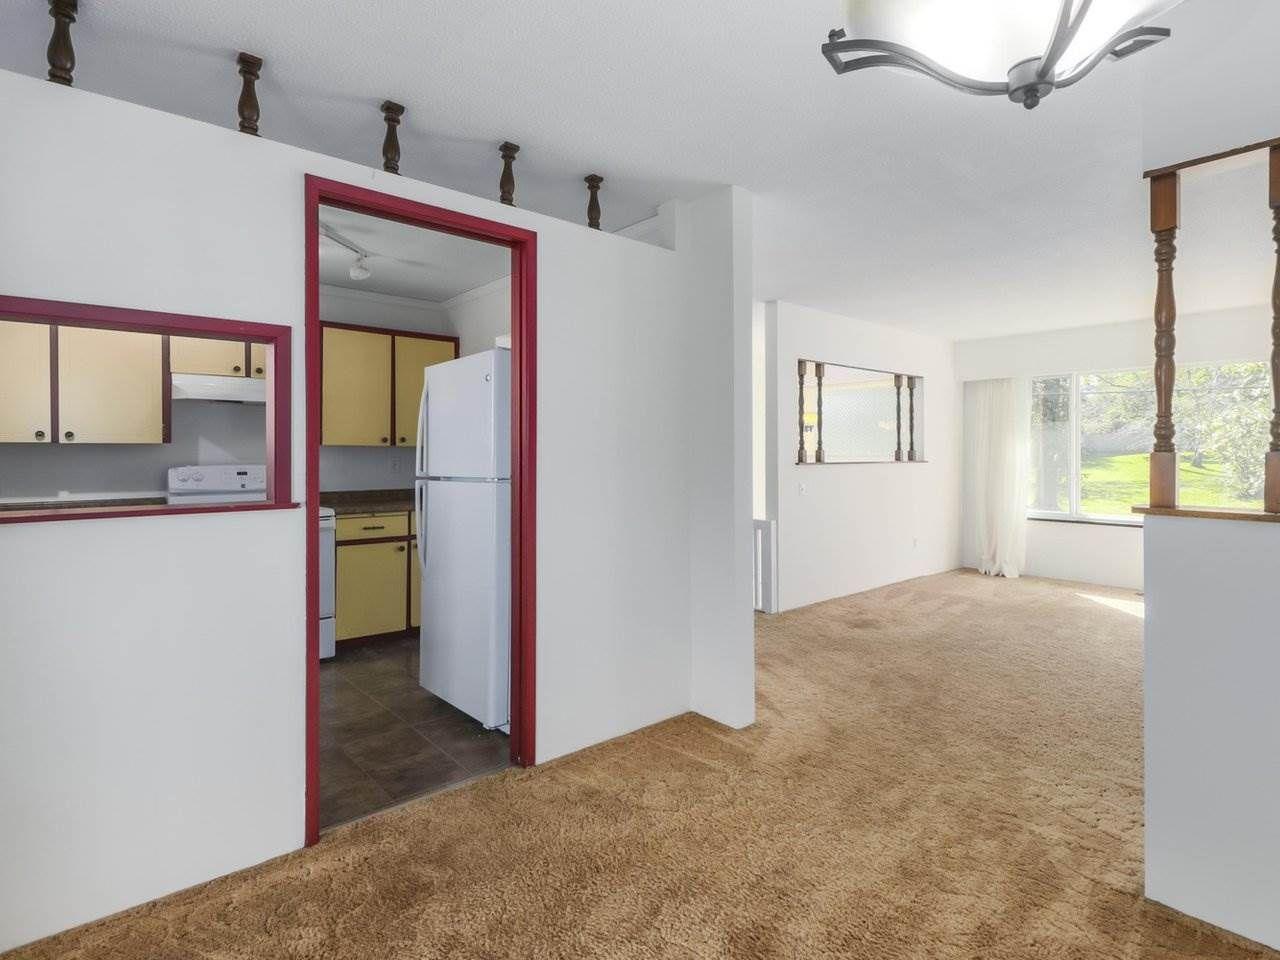 Photo 7: Photos: 1426 KENT Street: White Rock House for sale (South Surrey White Rock)  : MLS®# R2406738